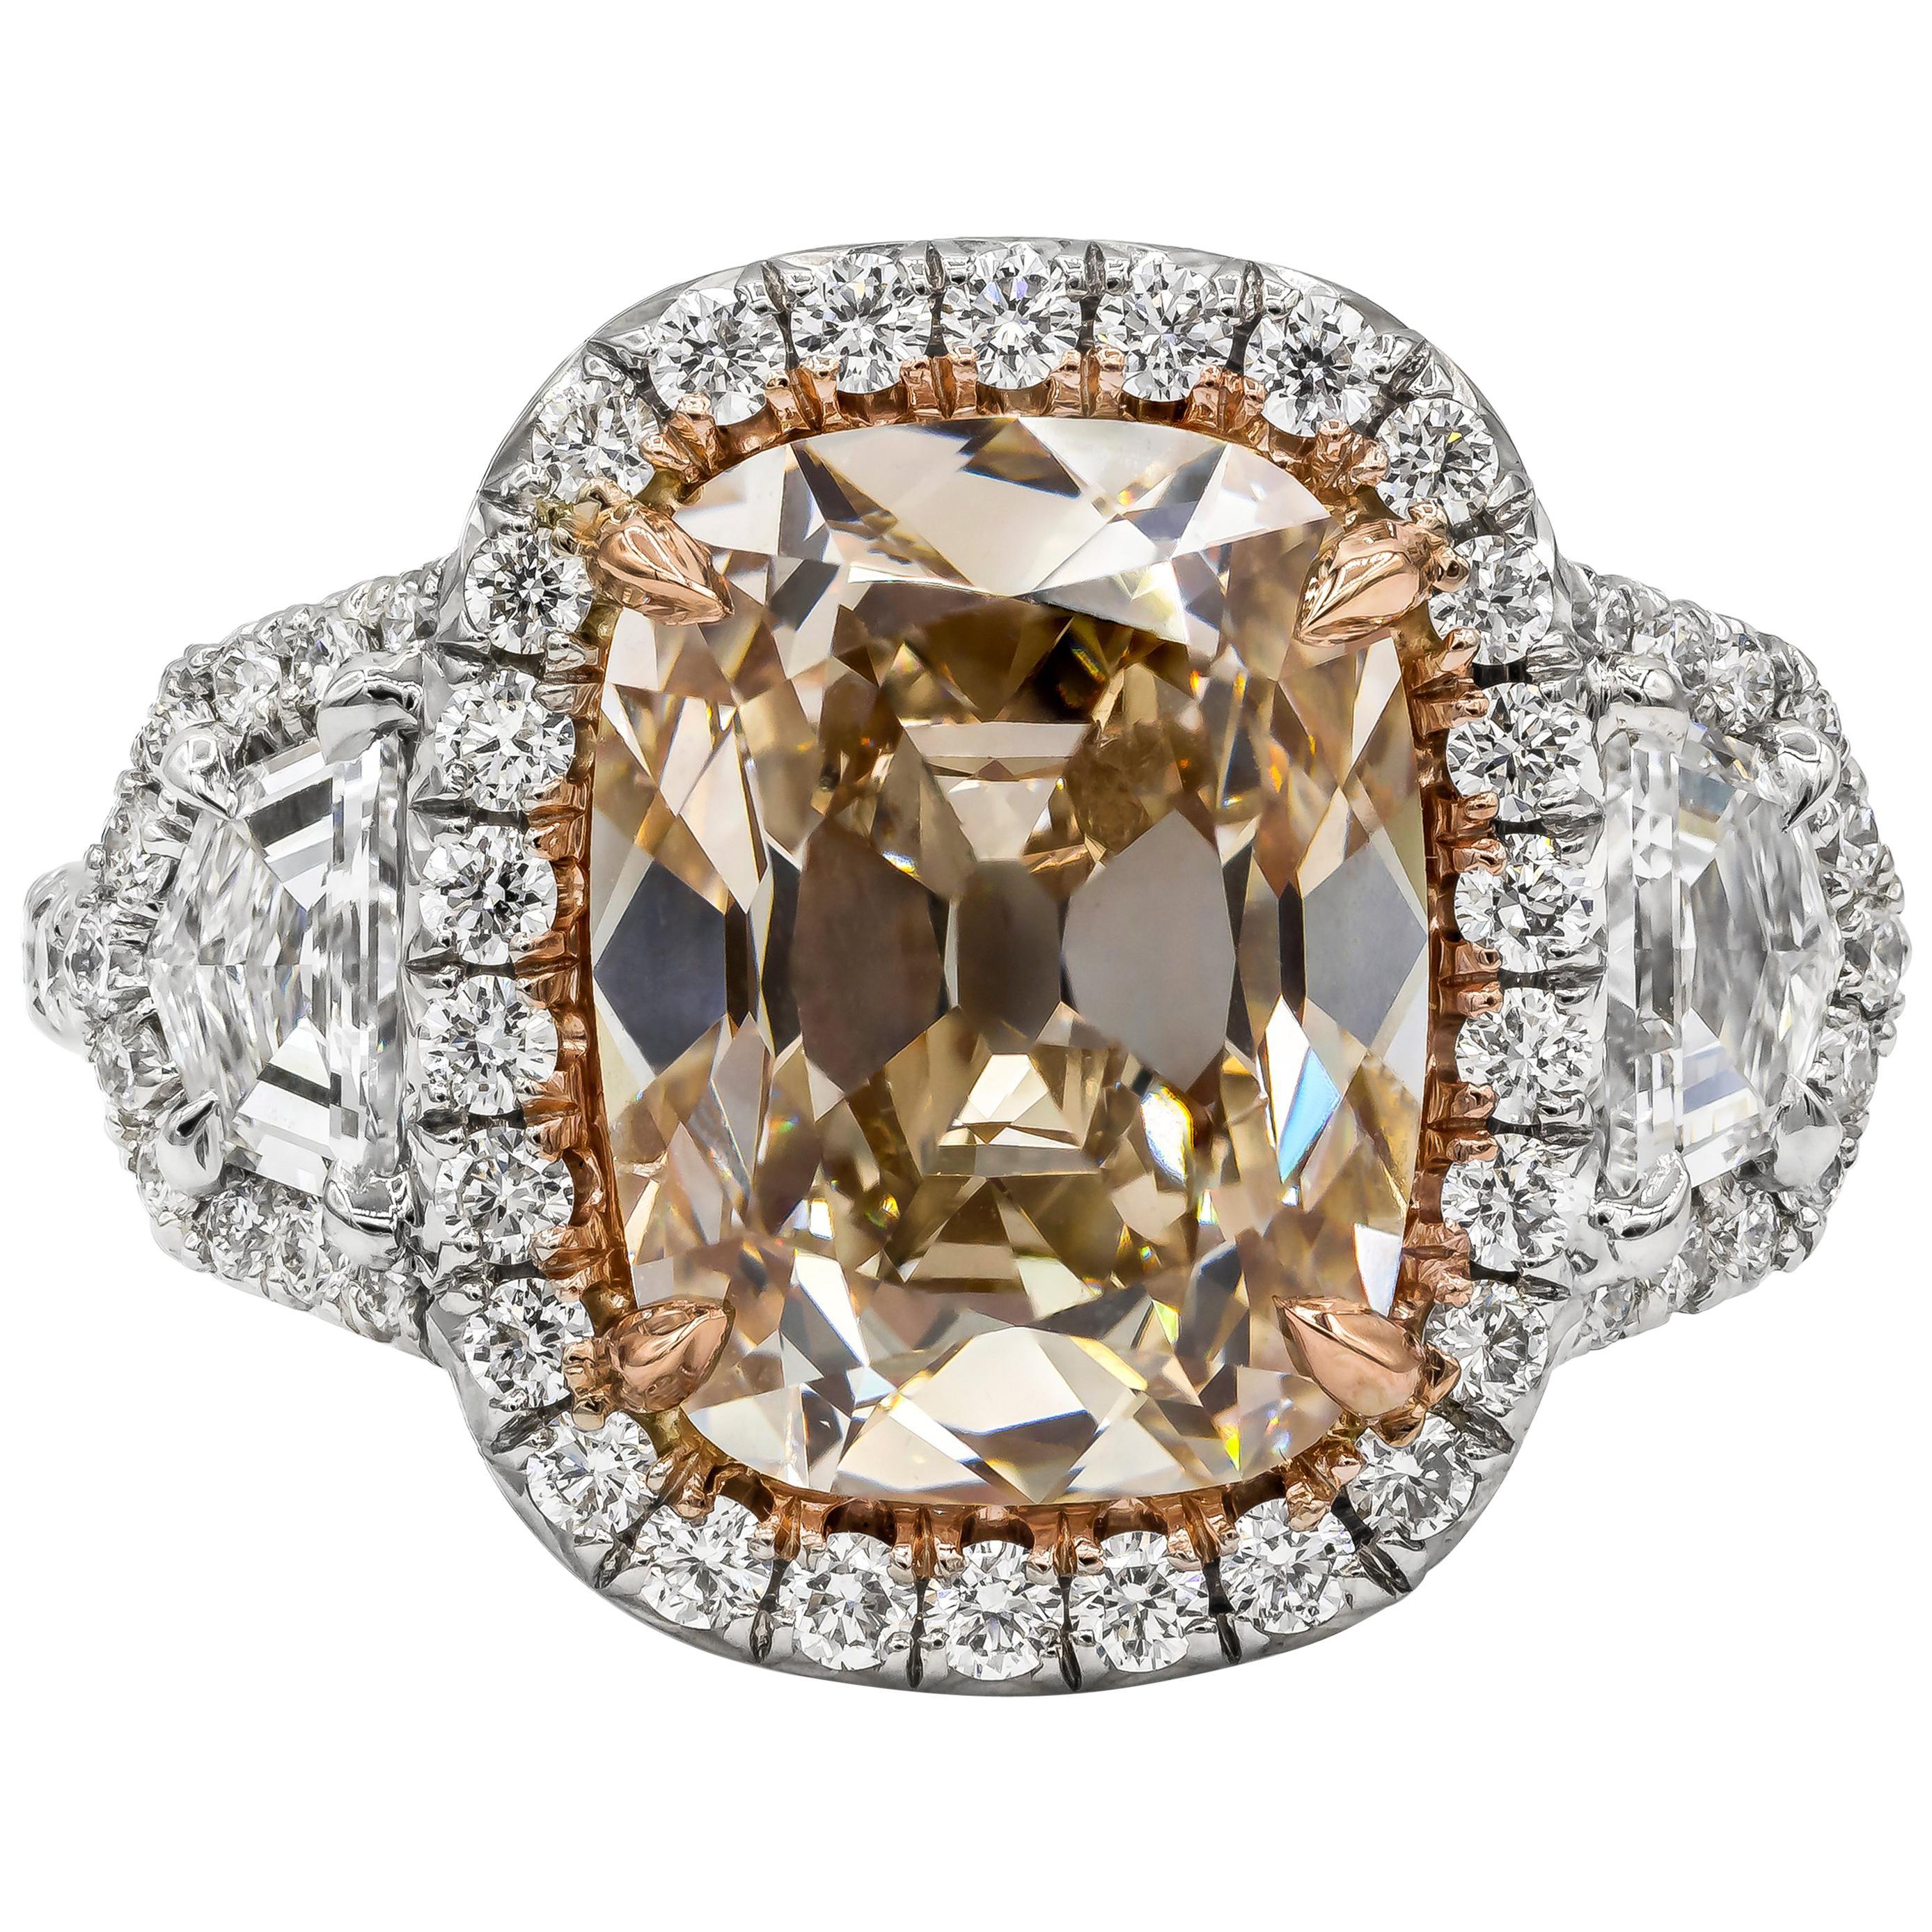 Roman Malakov 4.10 Carat Old Mine Cut Diamond Halo Three-Stone Engagement Ring